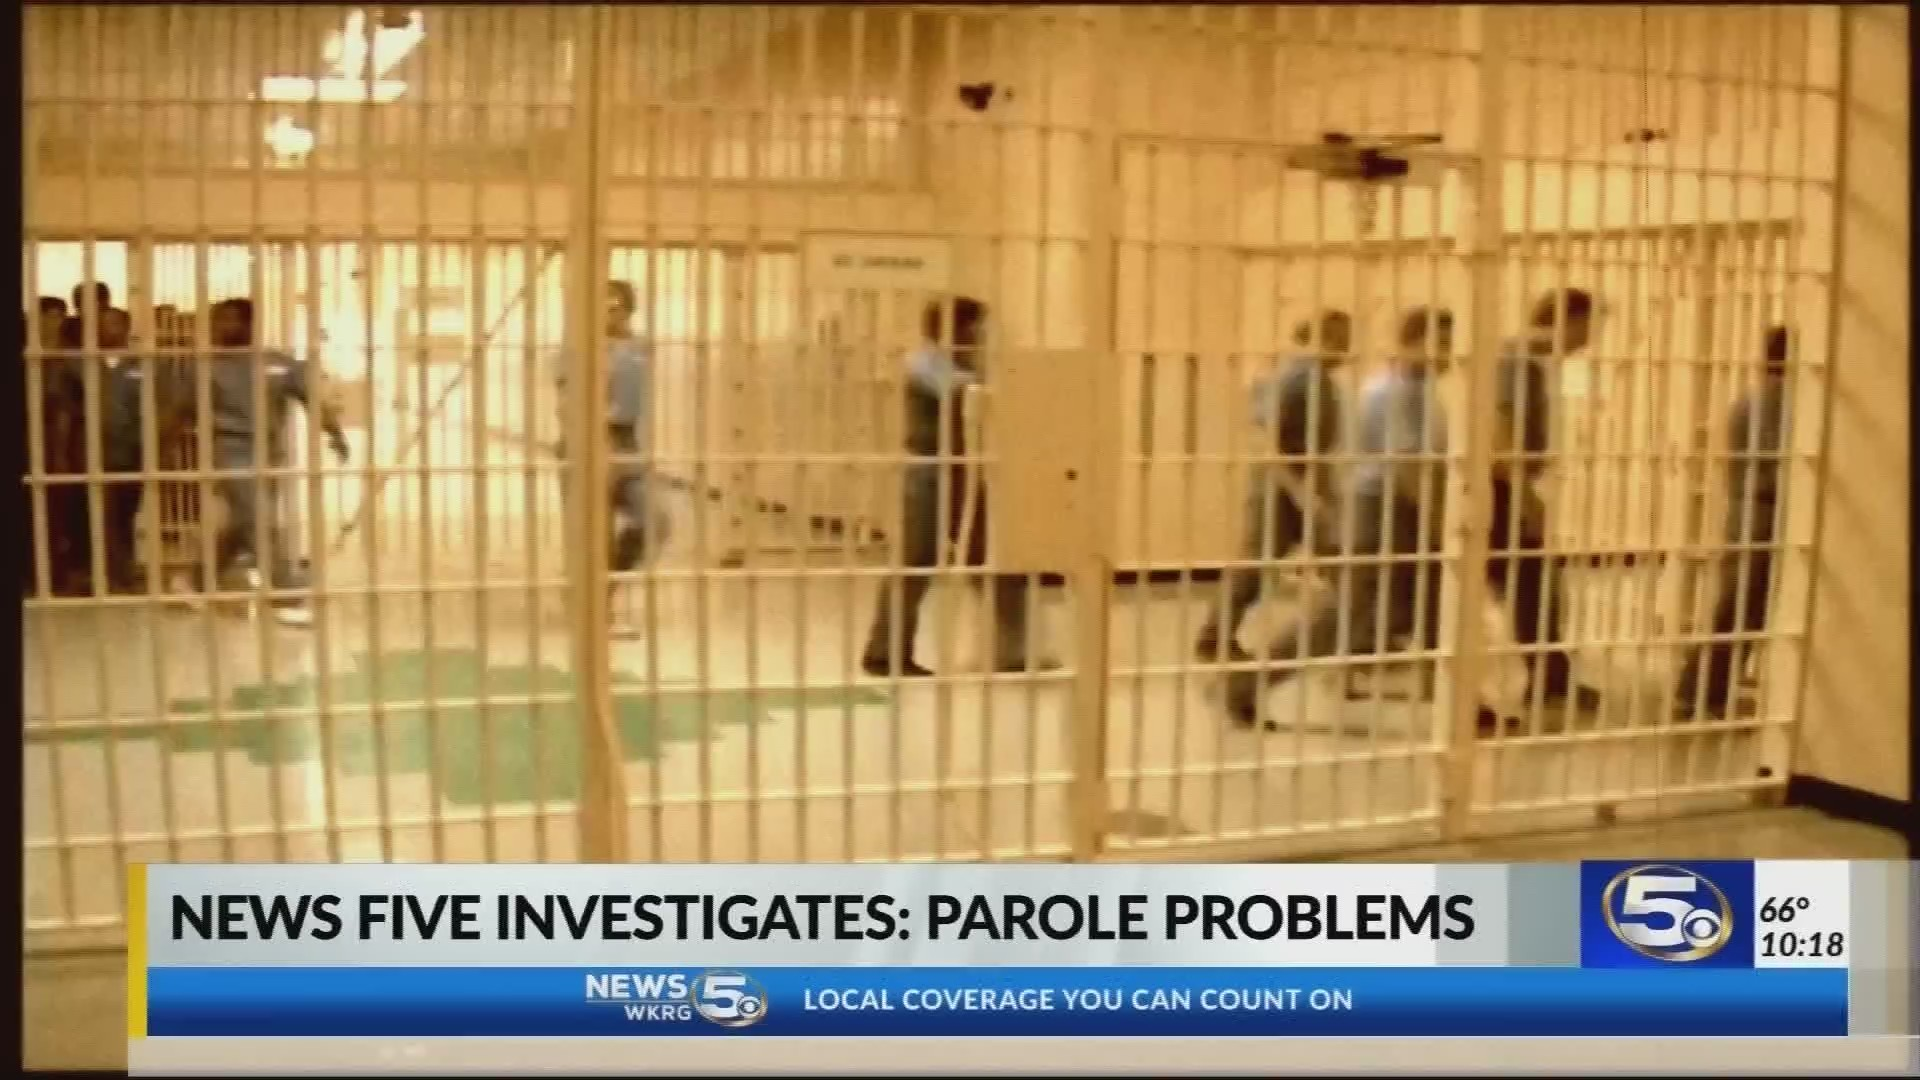 VIDEO: News 5 Investigates: Parole Problems